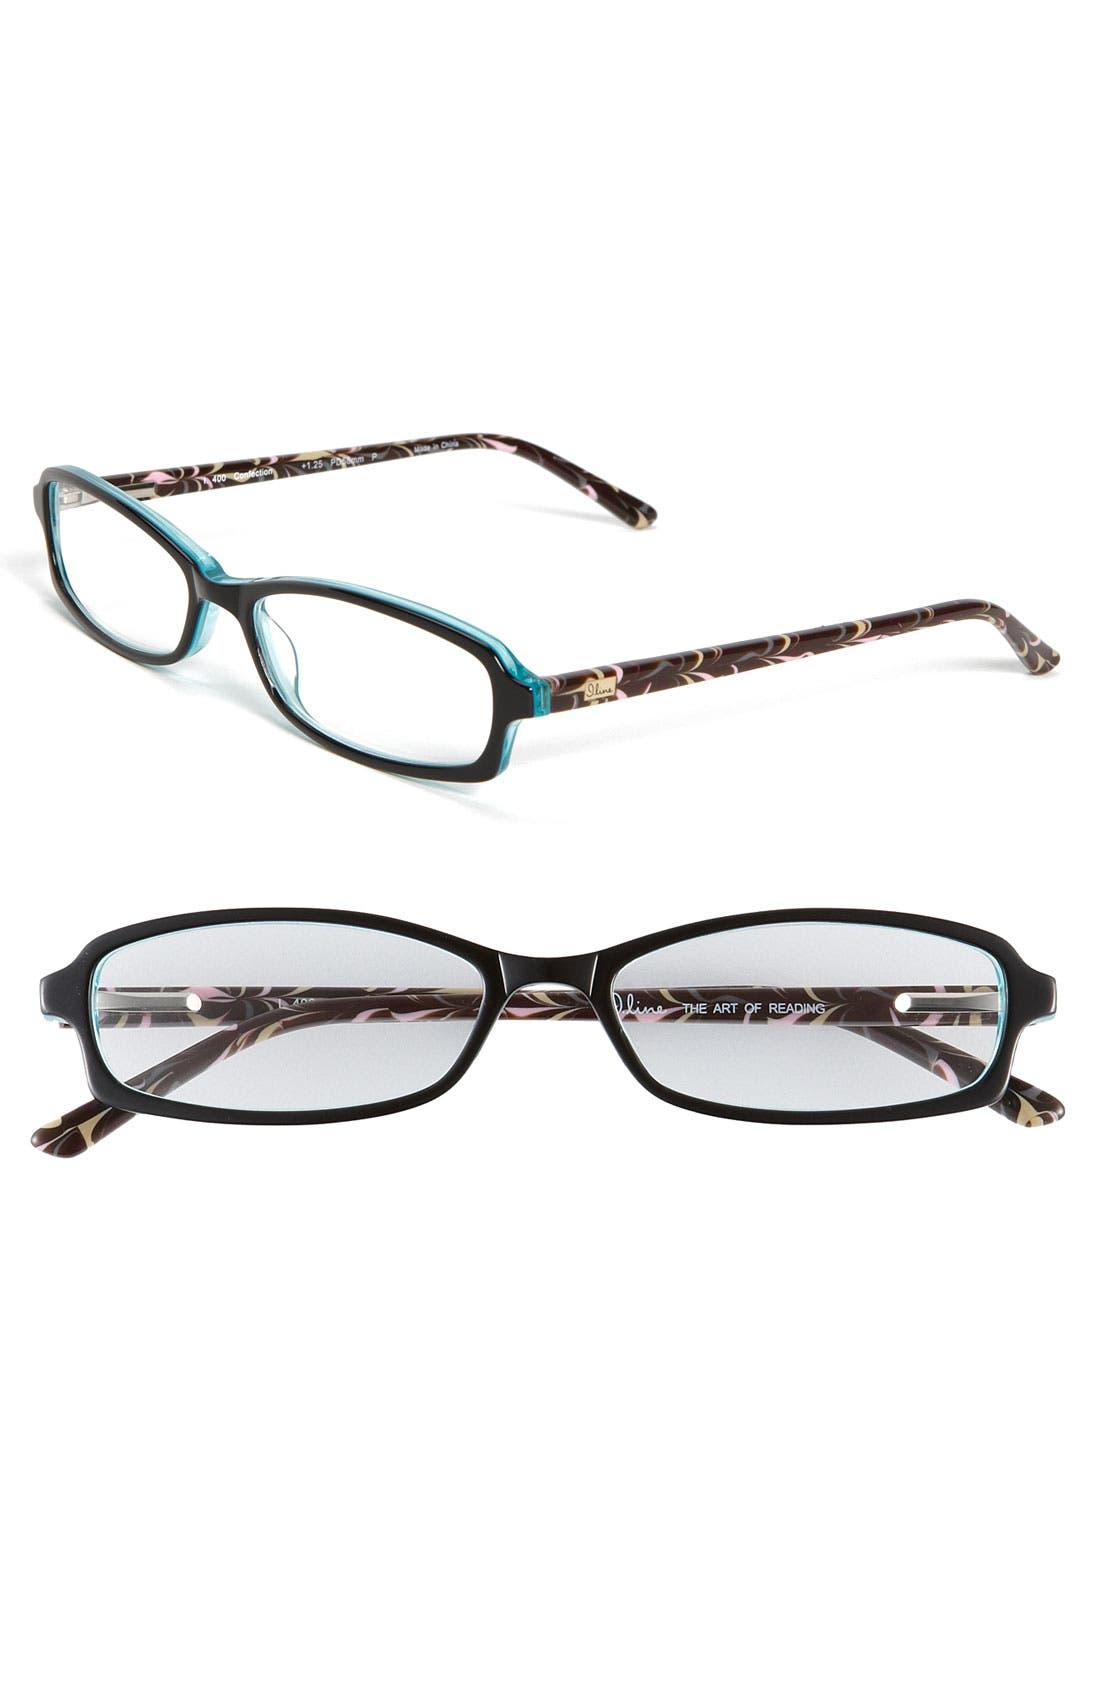 Alternate Image 1 Selected - I Line Eyewear 'Confection' Reading Glasses